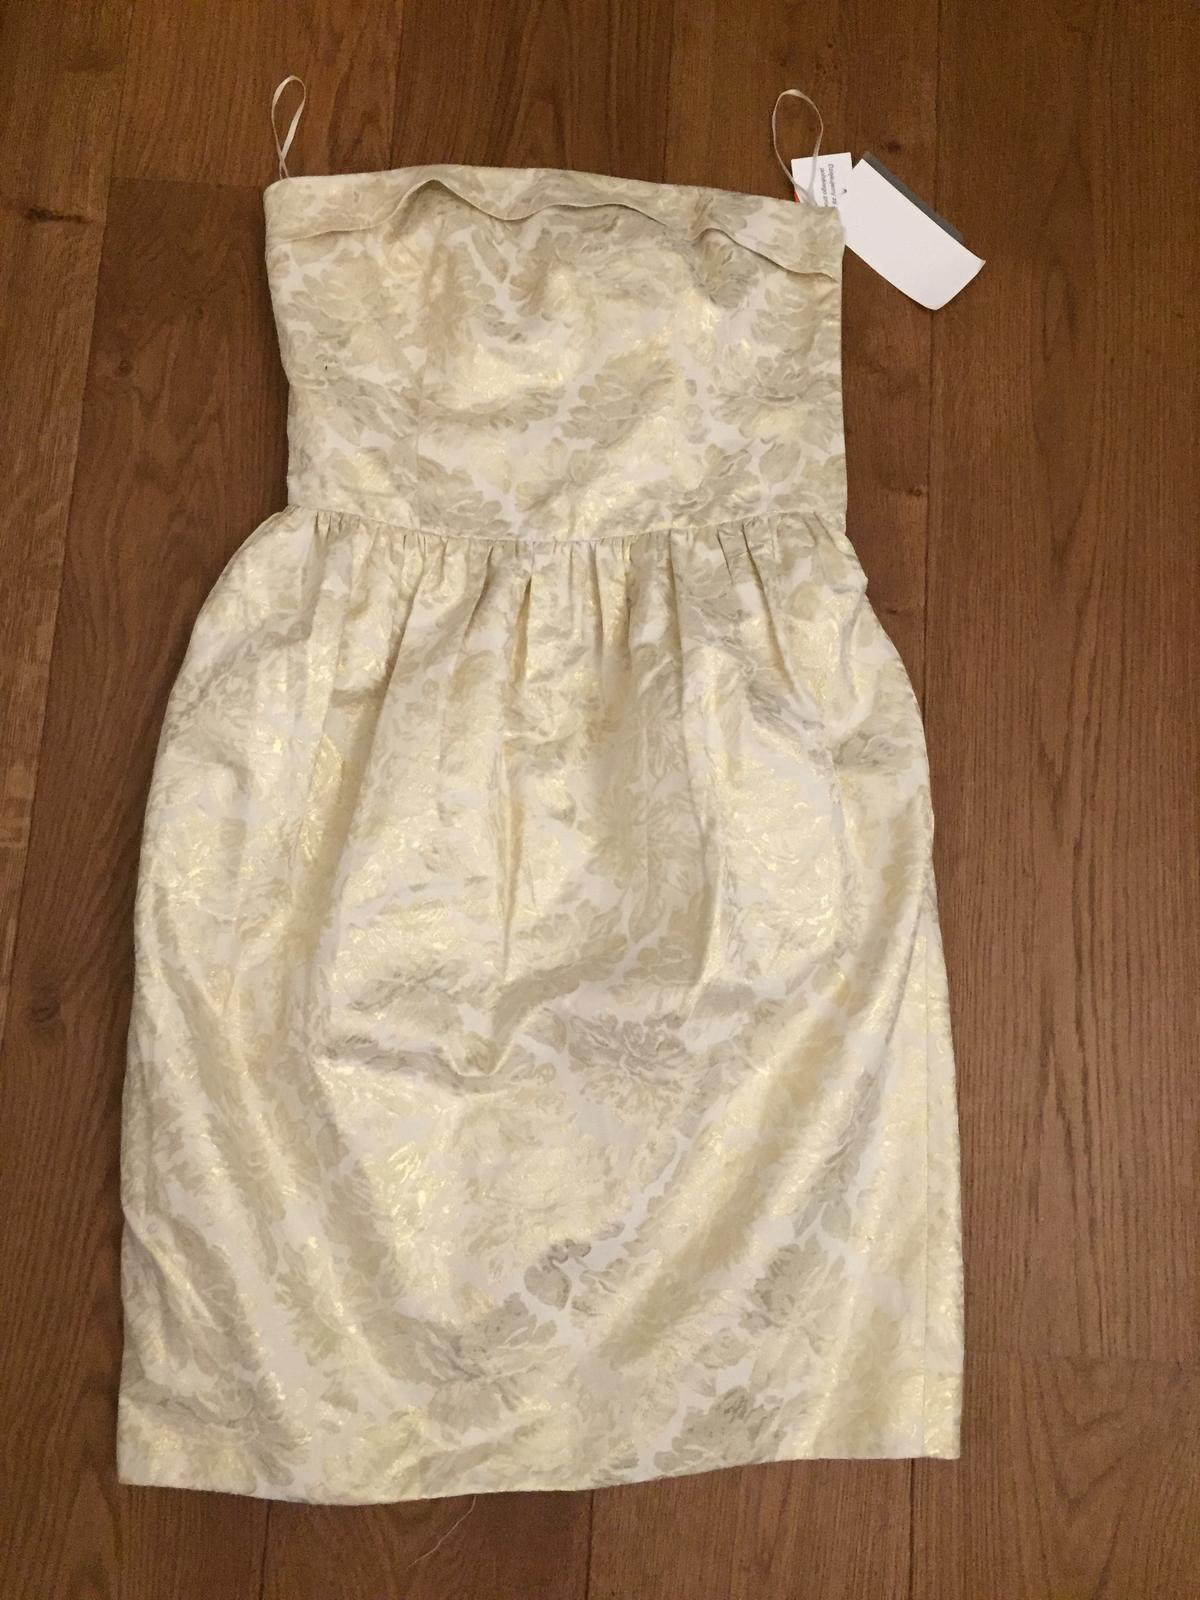 Zlatisté šaty S - Obrázok č. 1